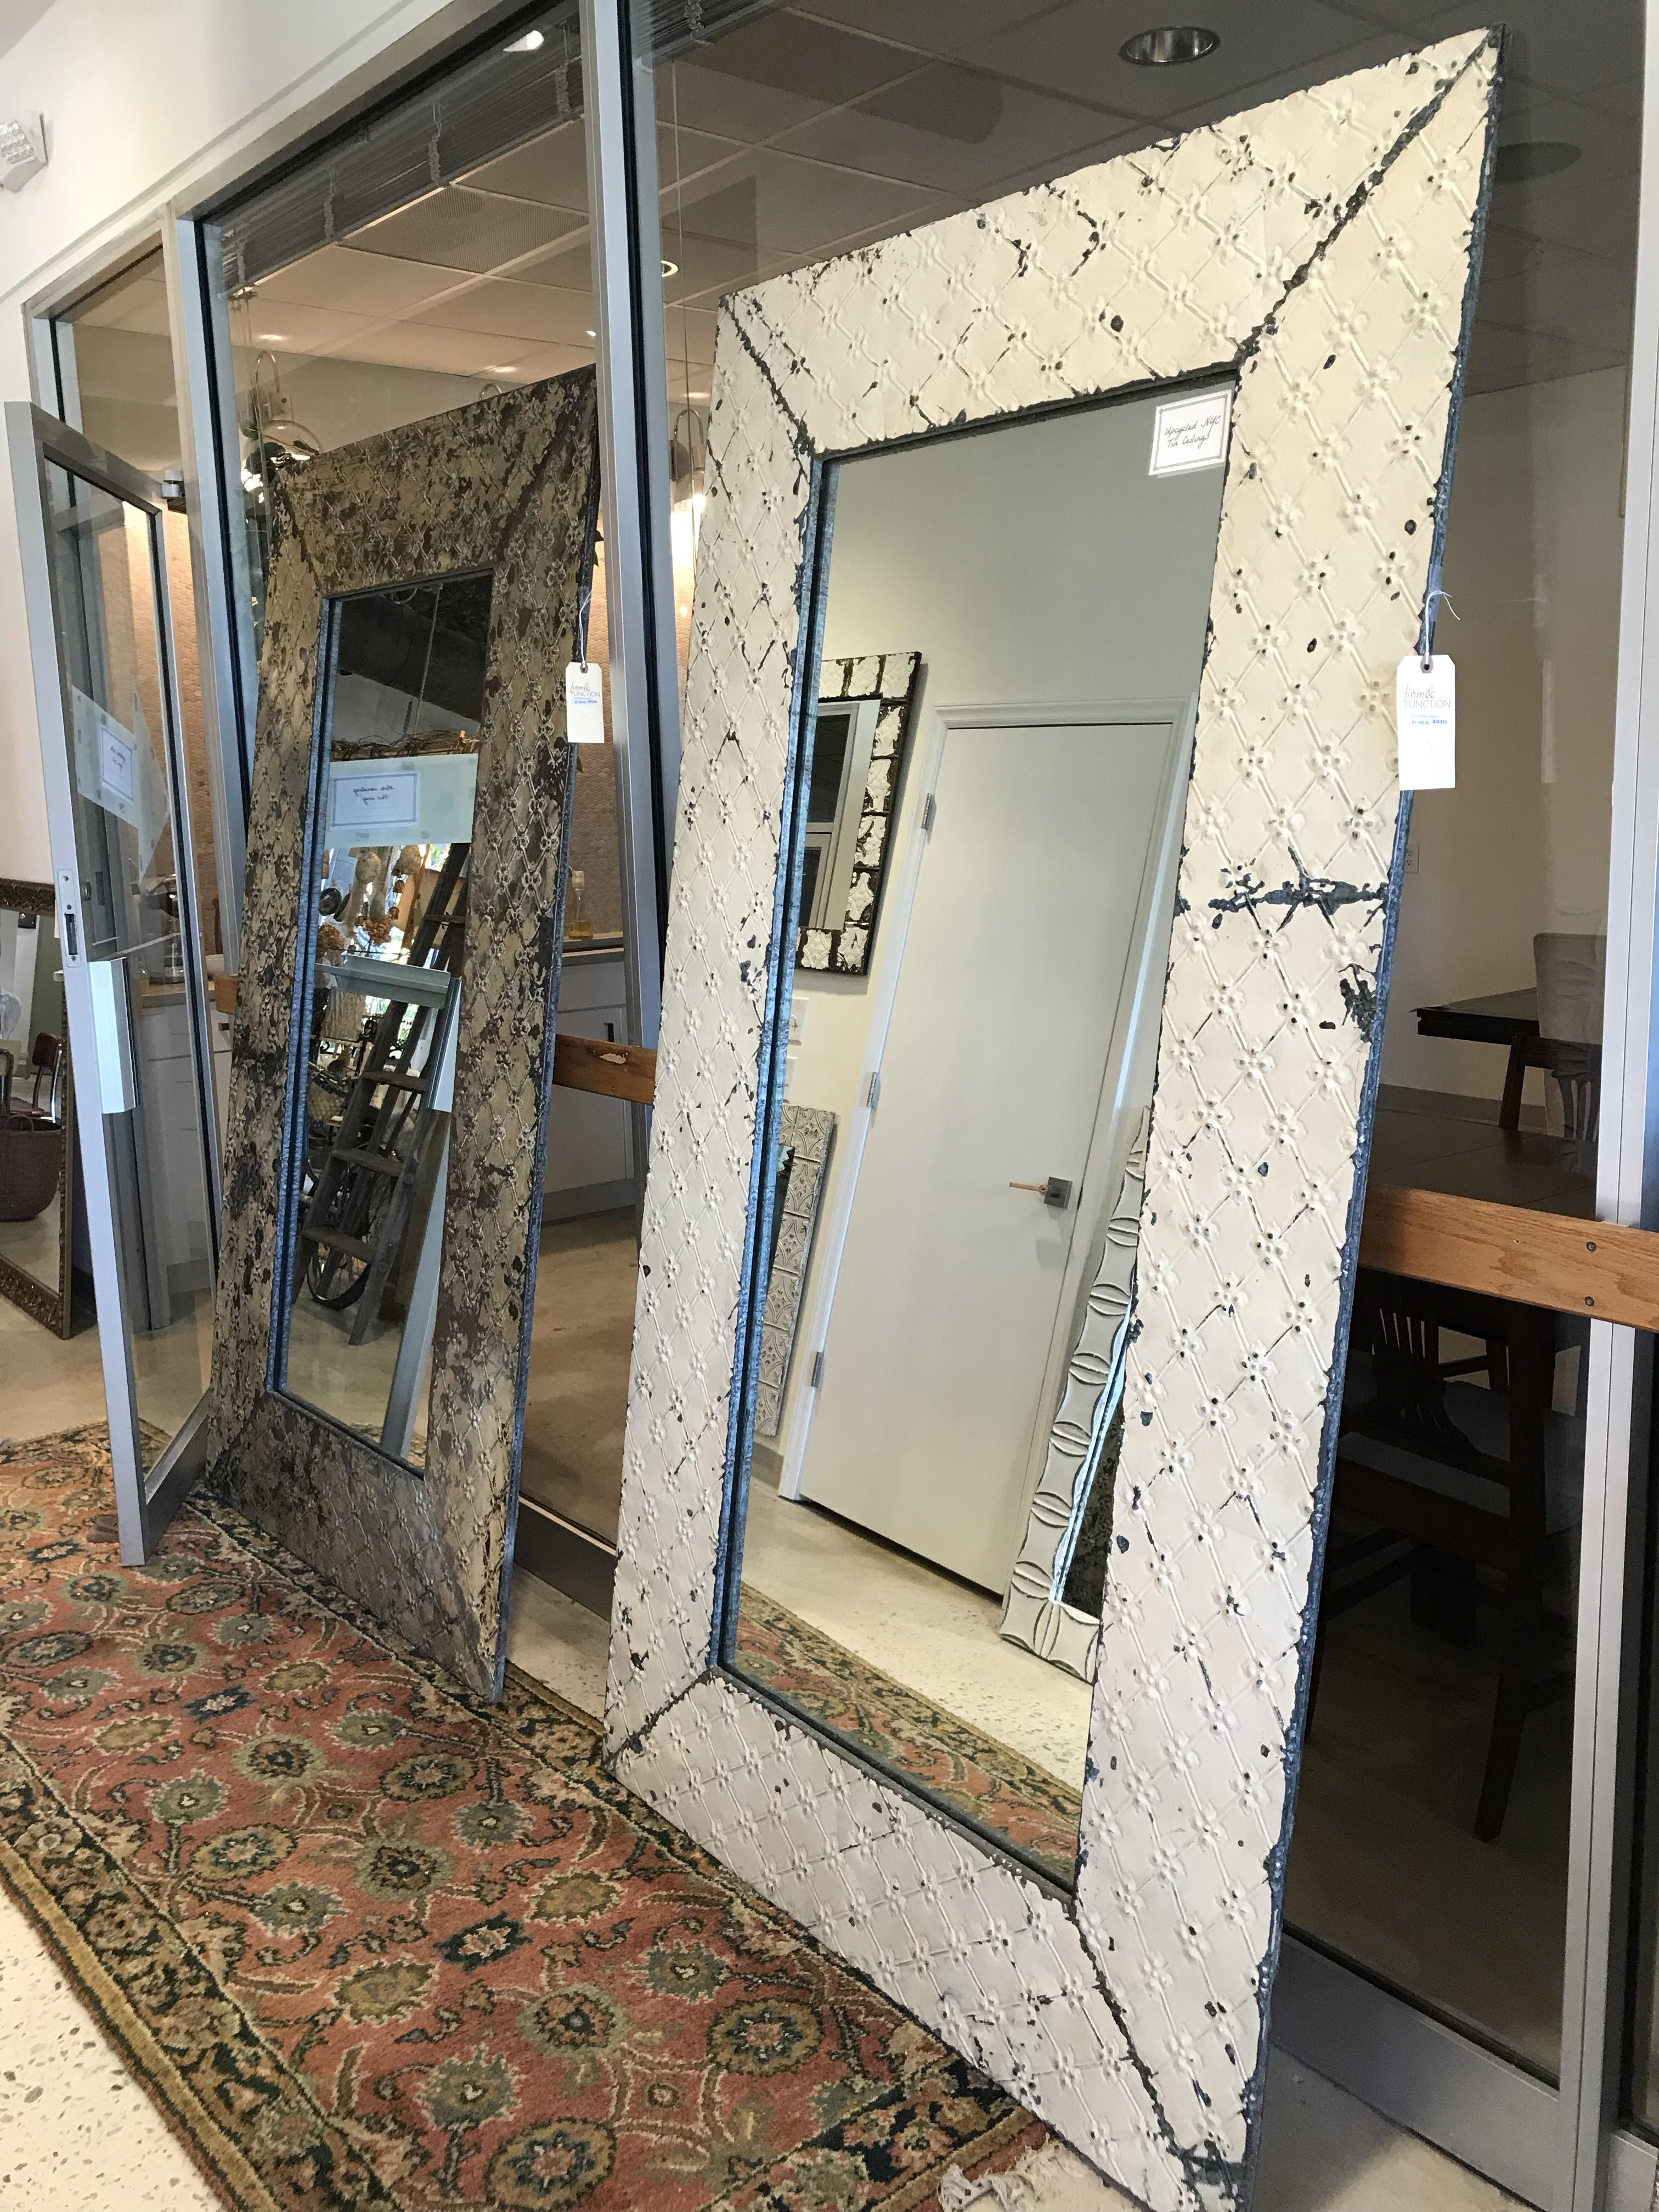 Mirrors, Art, Vintage Accessories, Antique Decor - Raleigh NC